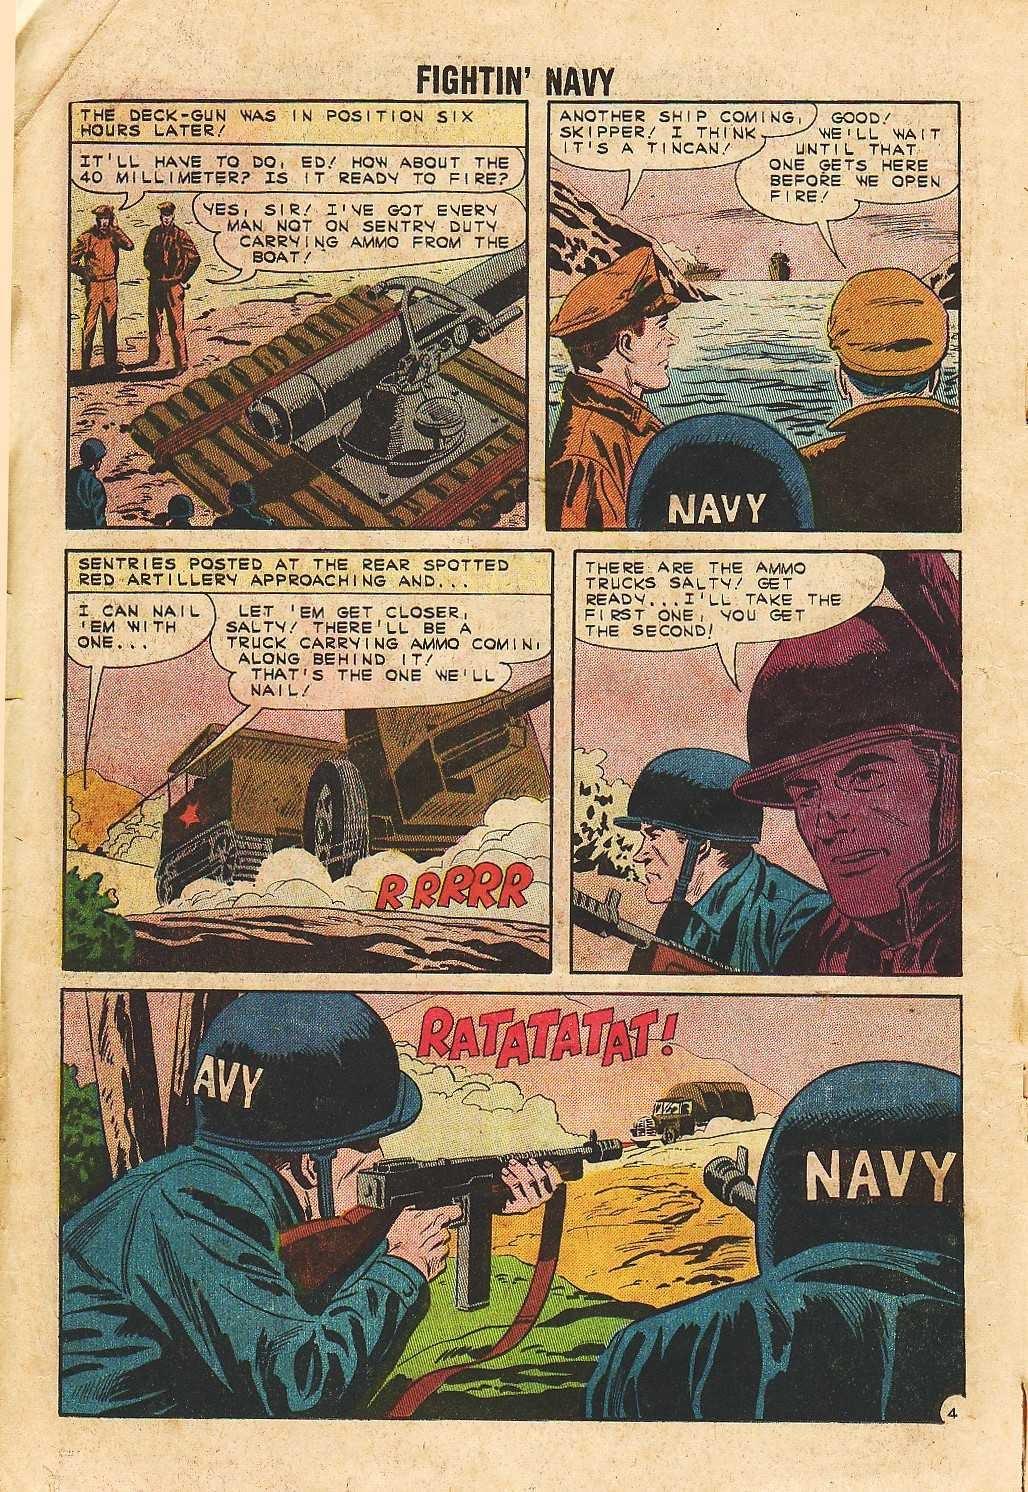 Read online Fightin' Navy comic -  Issue #105 - 18